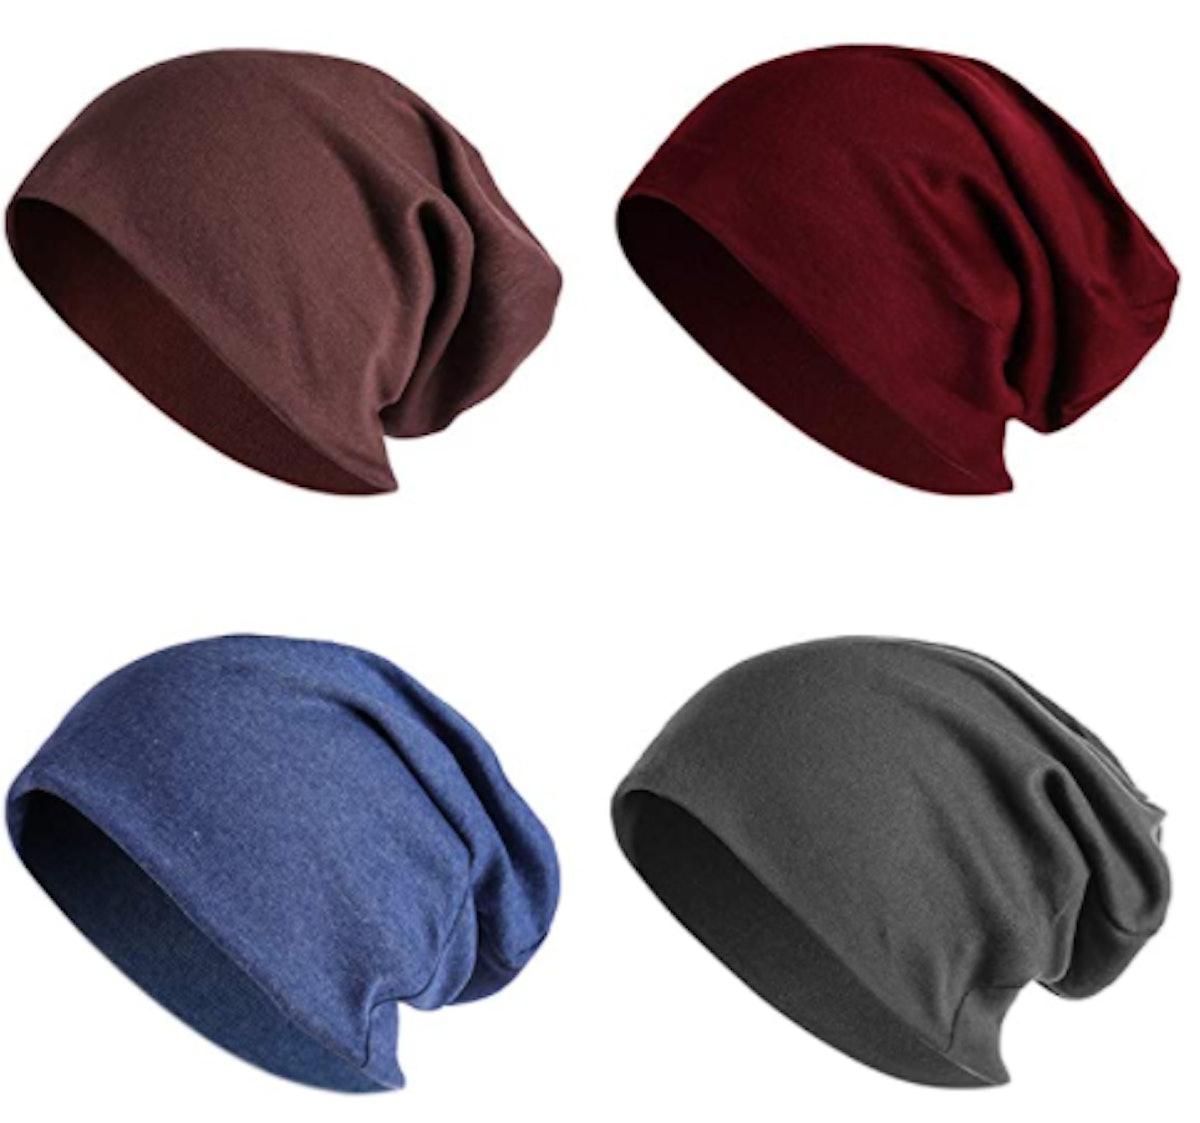 Joyebuy Slouchy Knit Beanies (4-Pack)